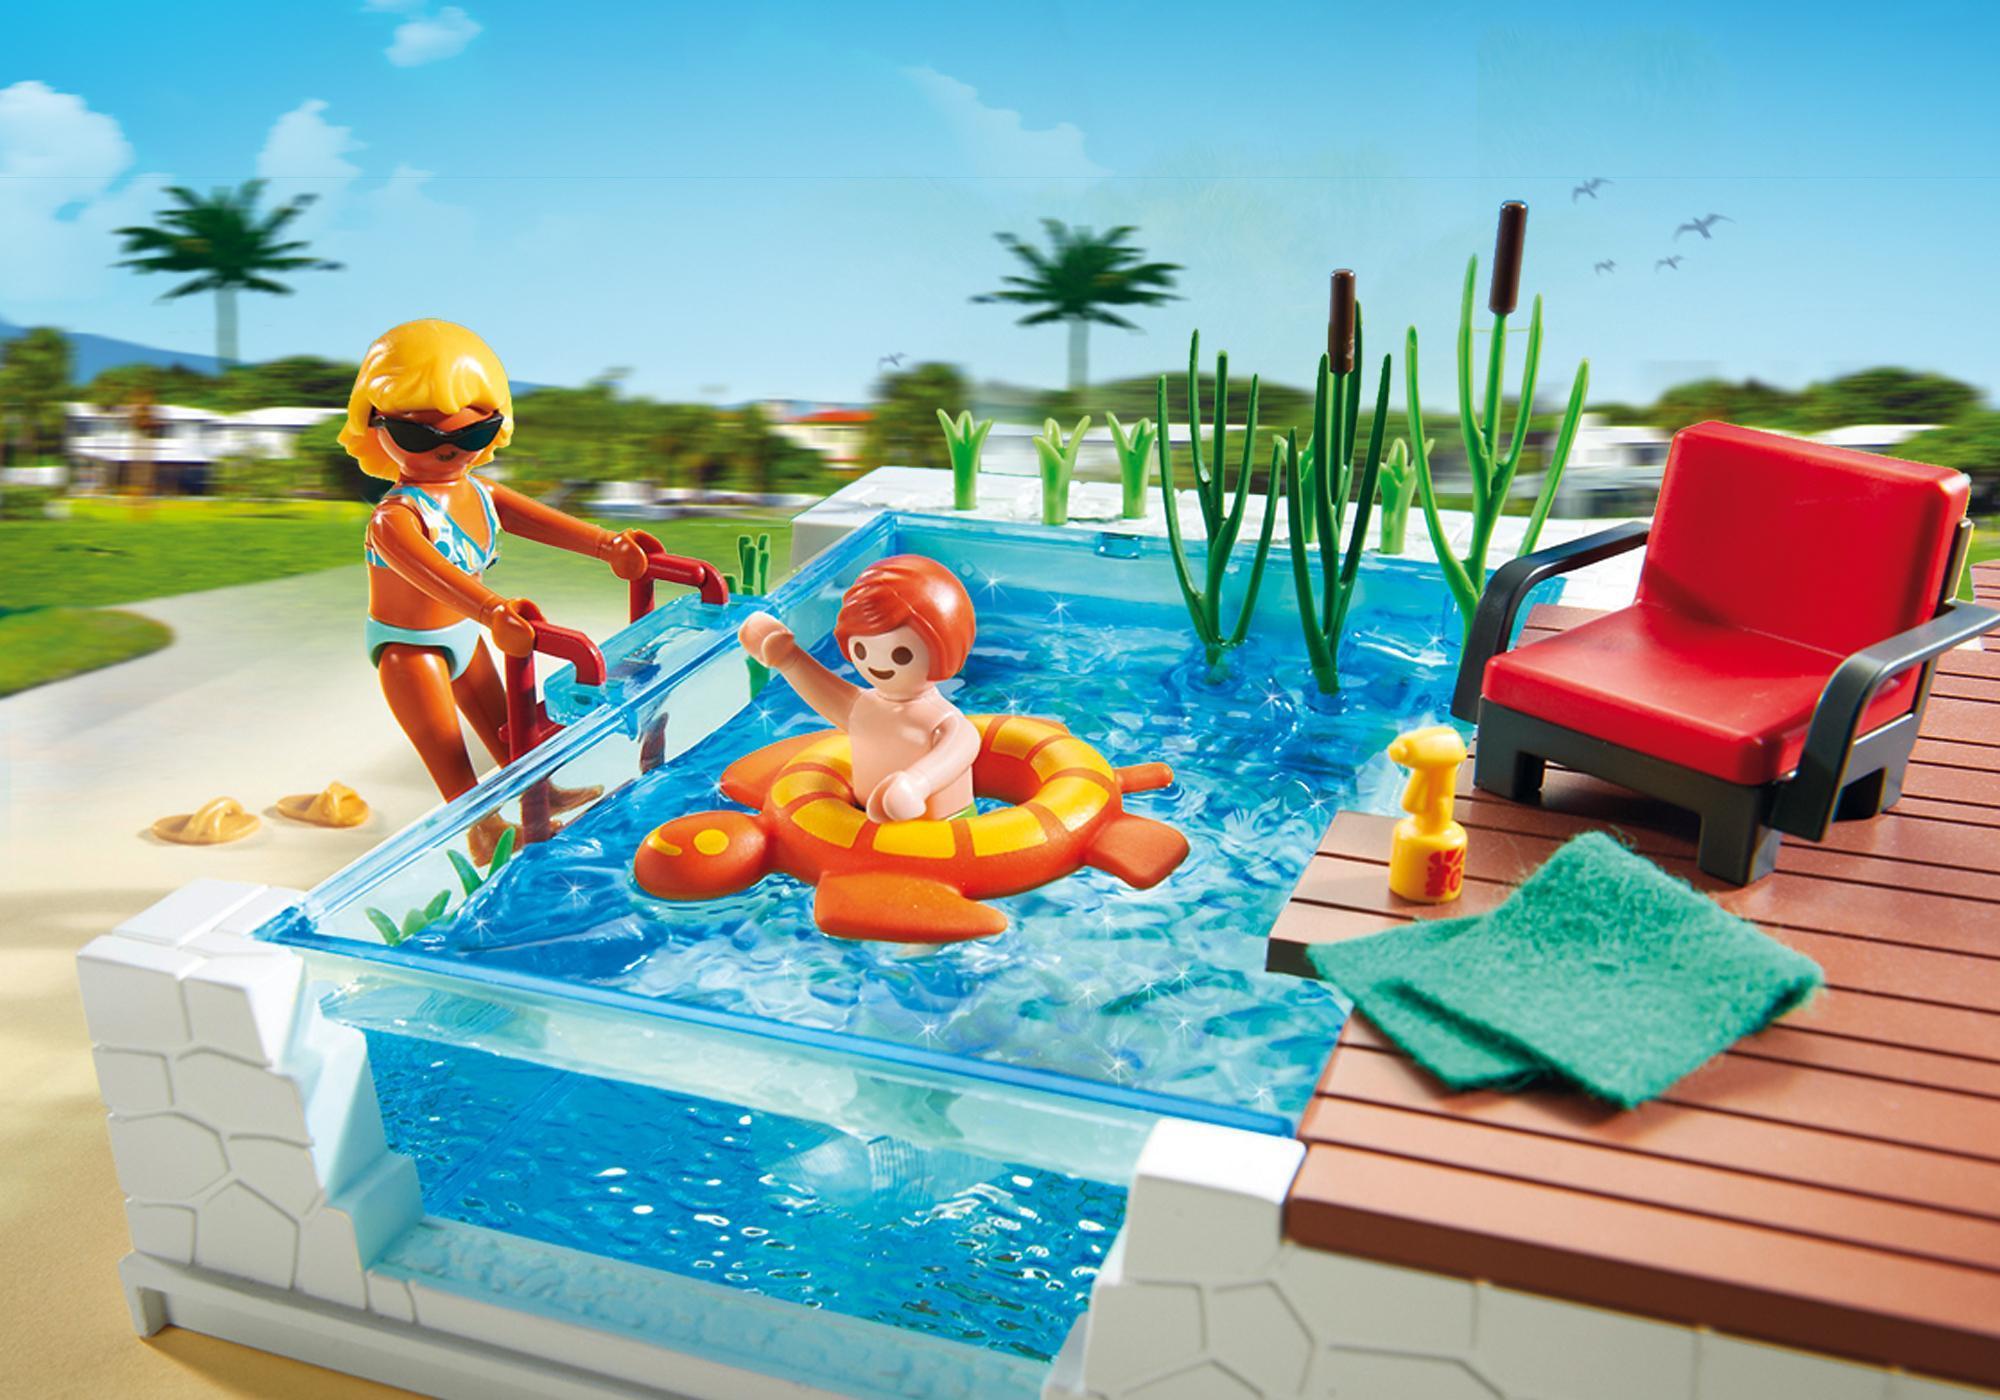 http://media.playmobil.com/i/playmobil/5575_product_extra1/Zwembad met terras